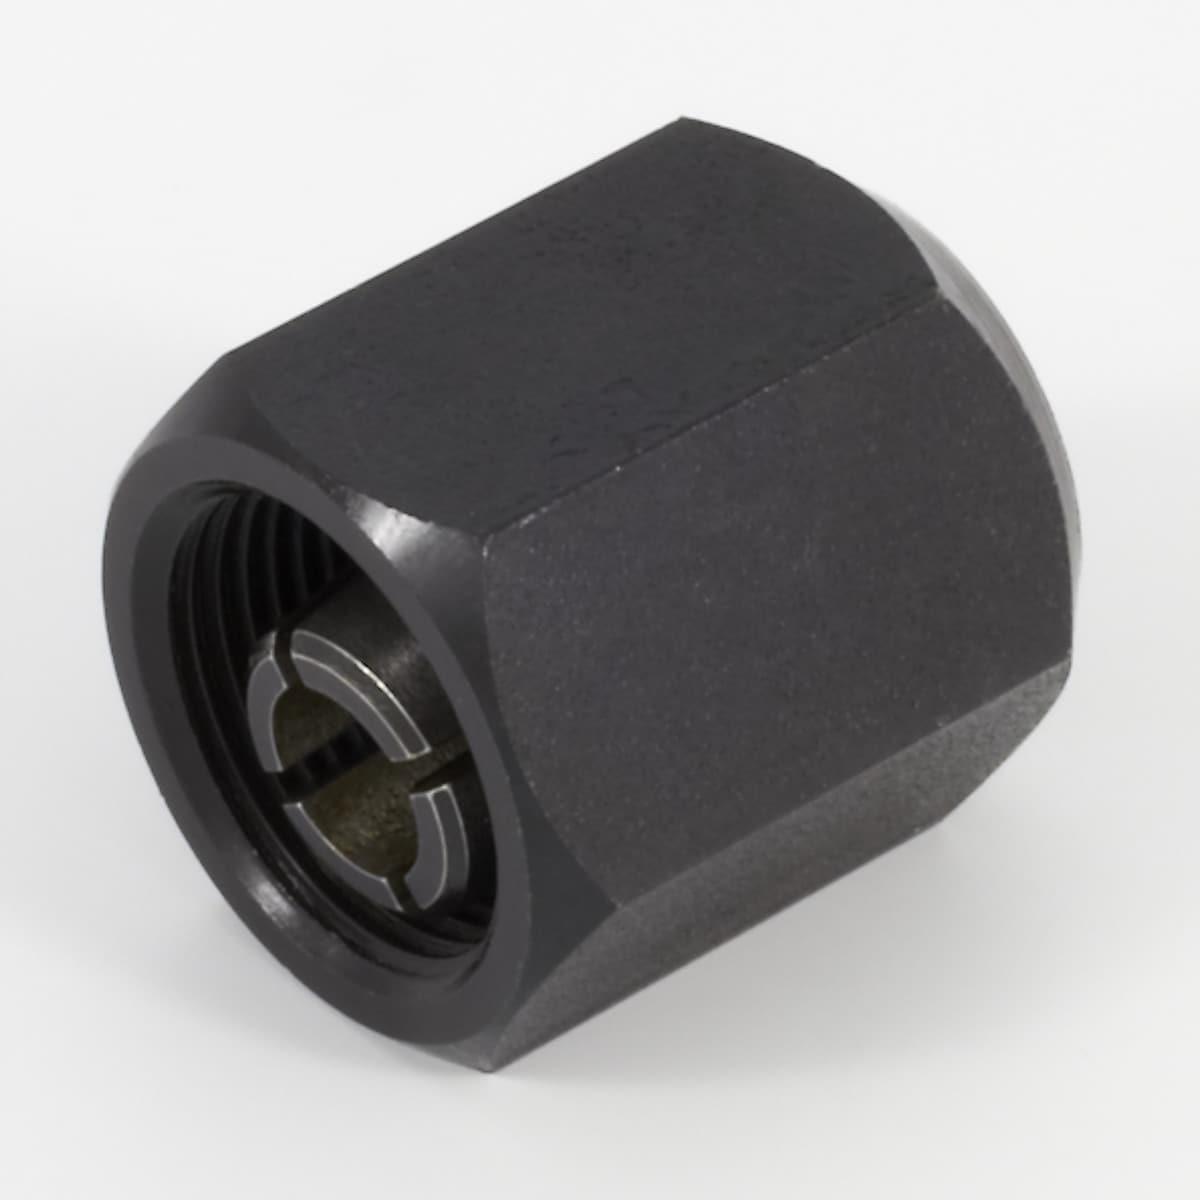 Spannzangenfutter 6 mm Bosch